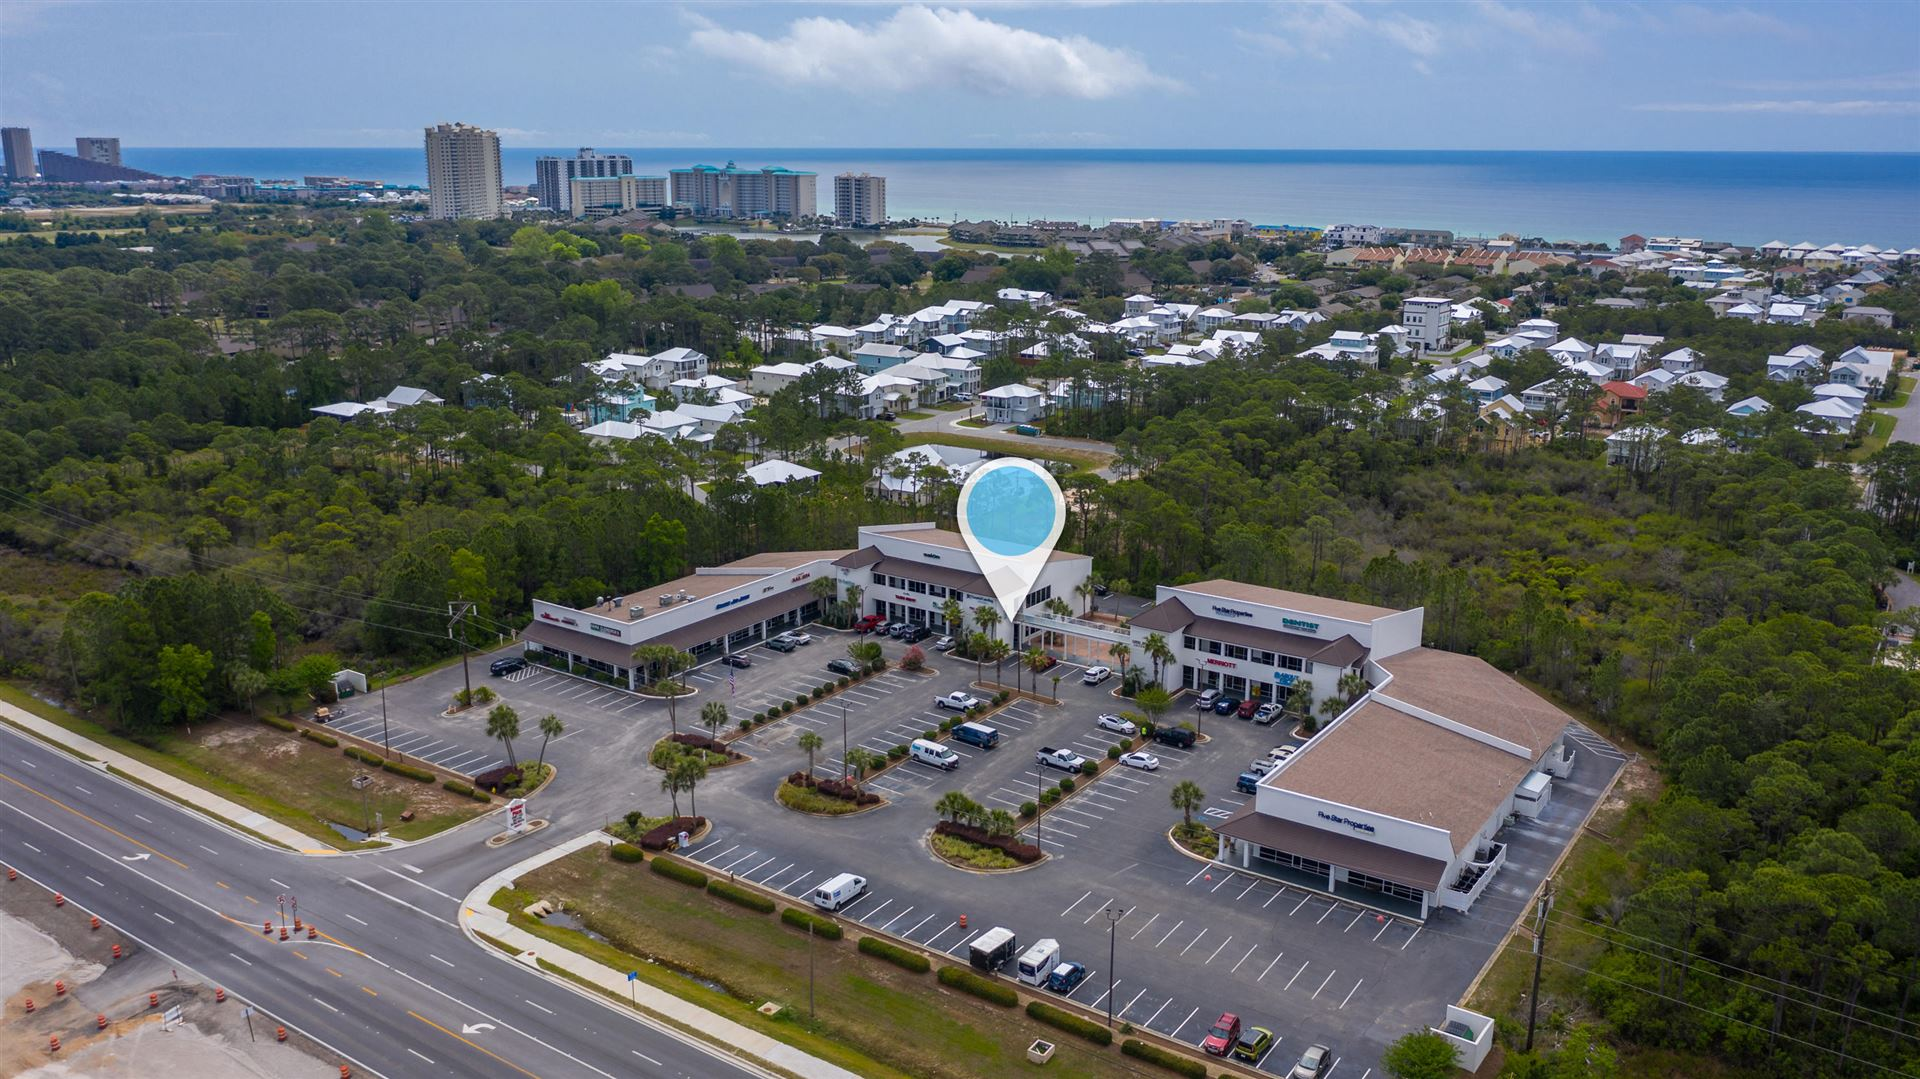 12273 W Us Highway 98 #UNIT 111, Miramar Beach, FL 32550 - #: 843354